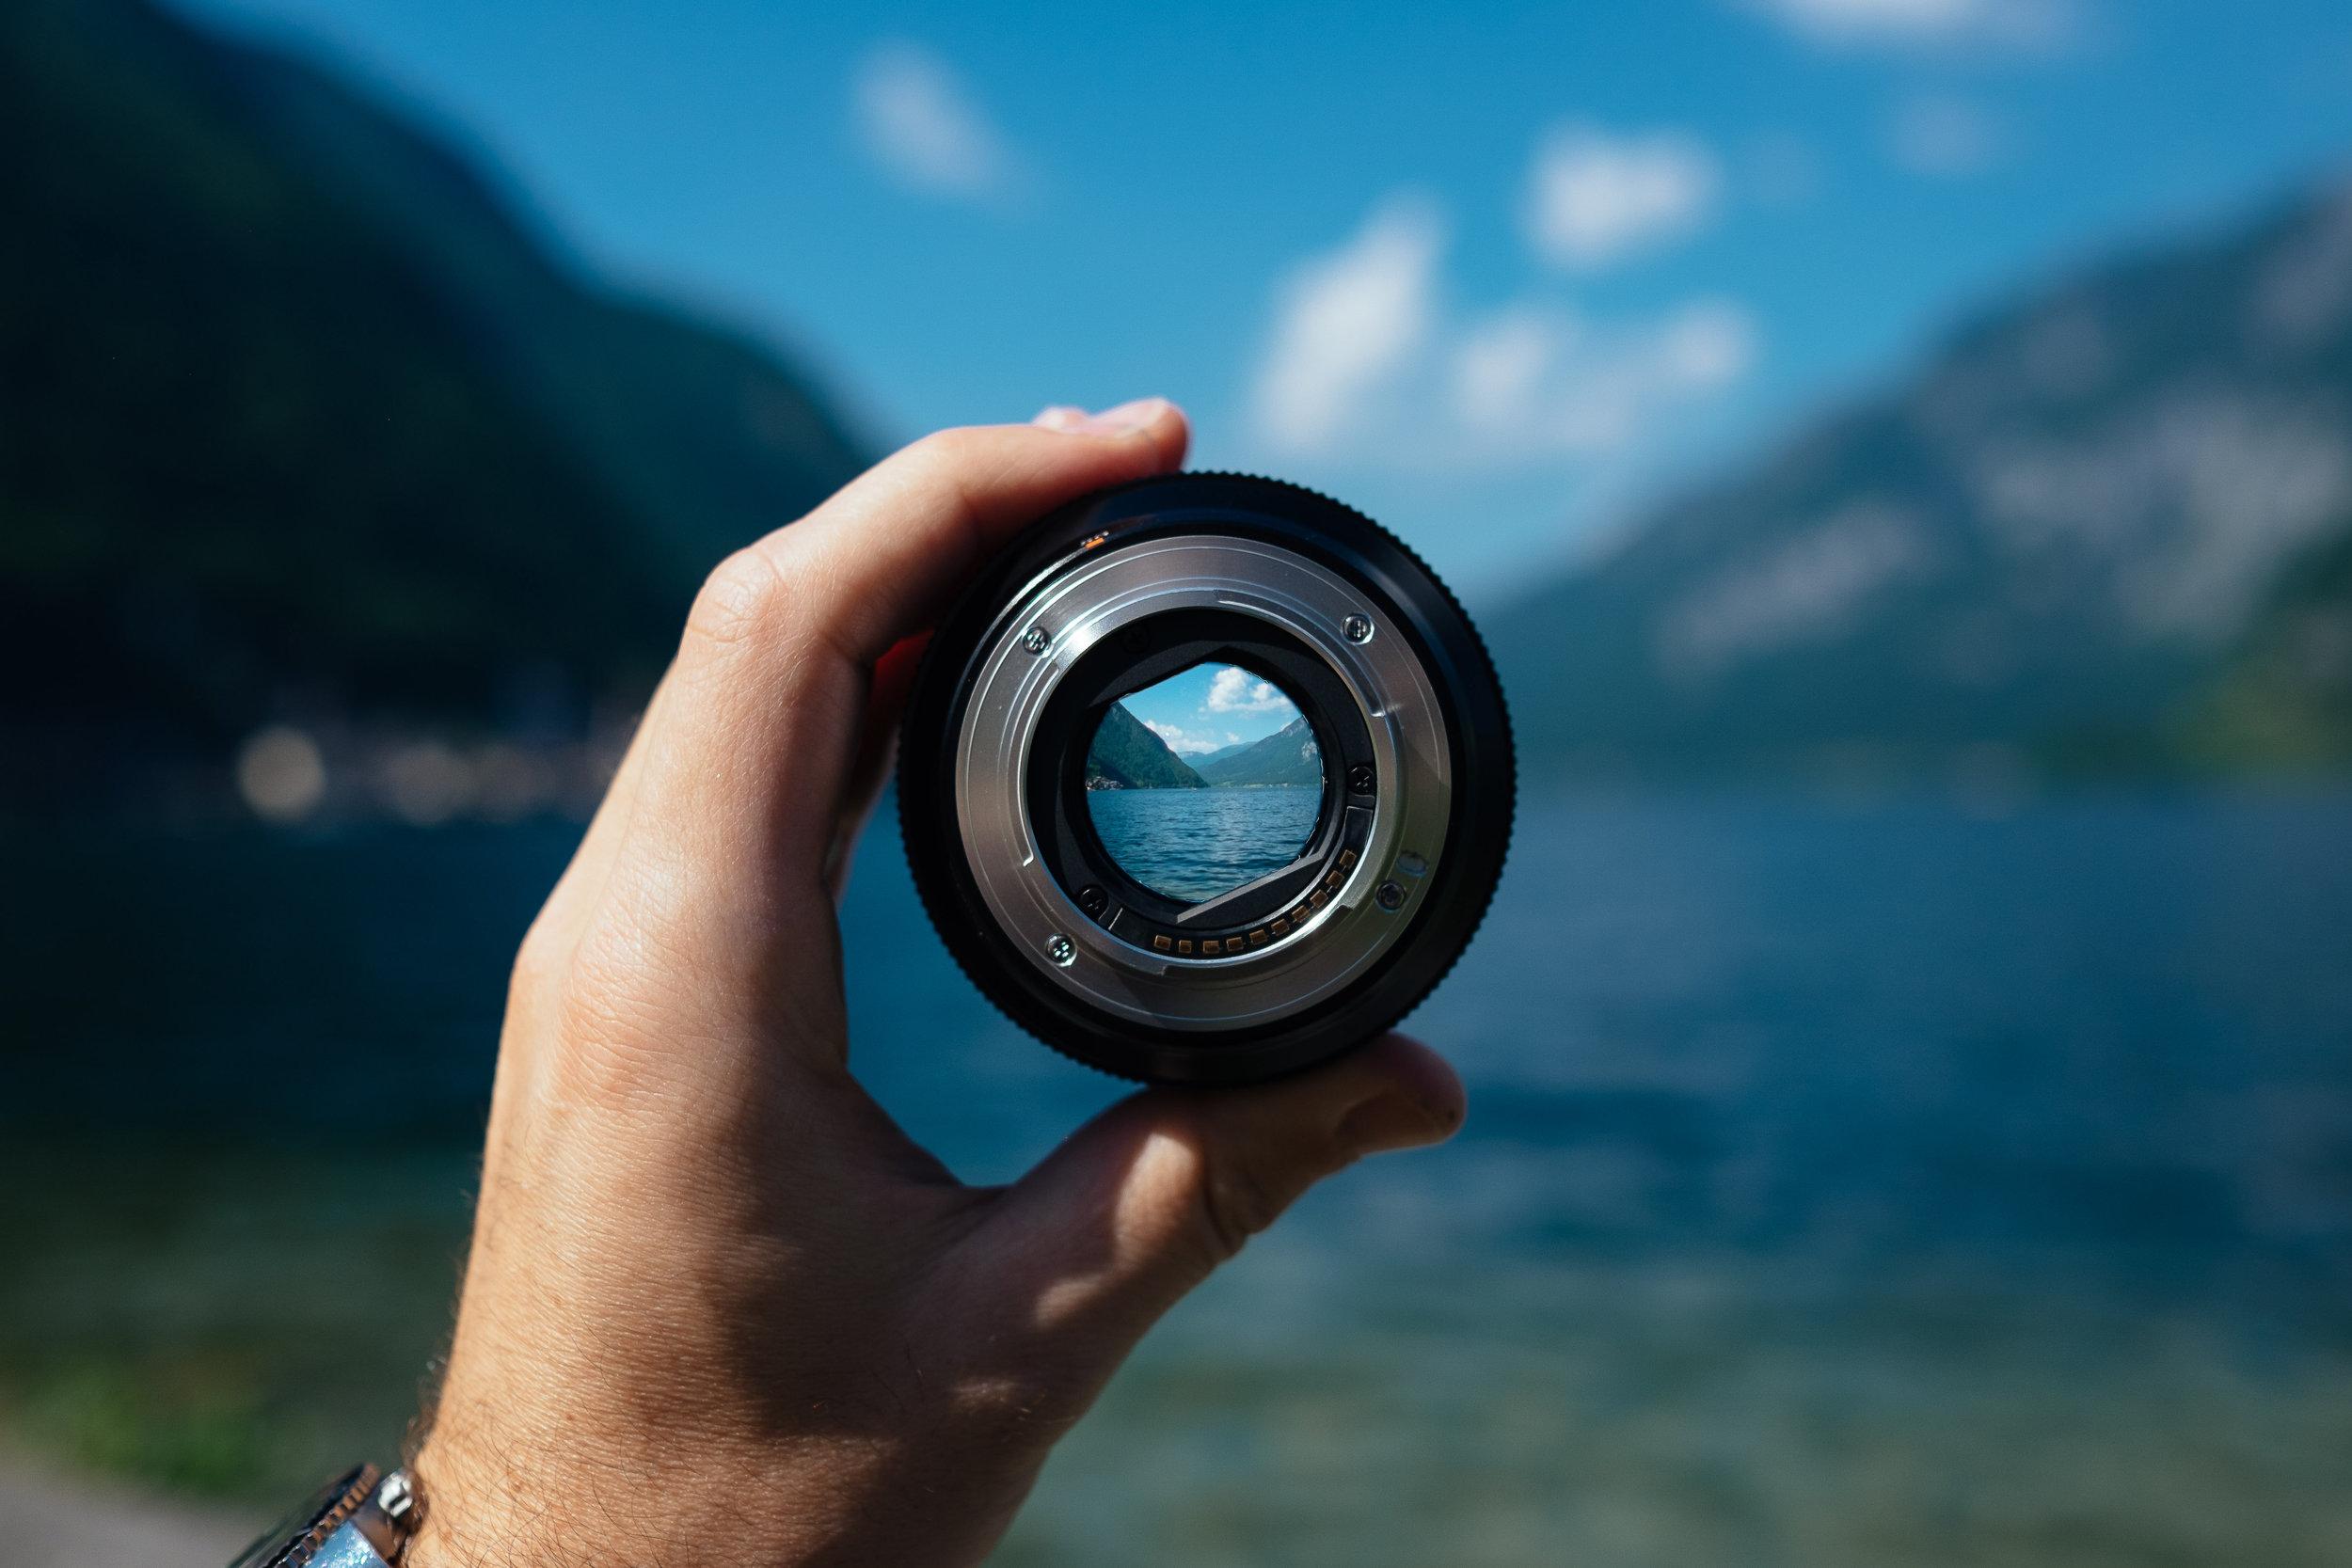 camera lens with focus